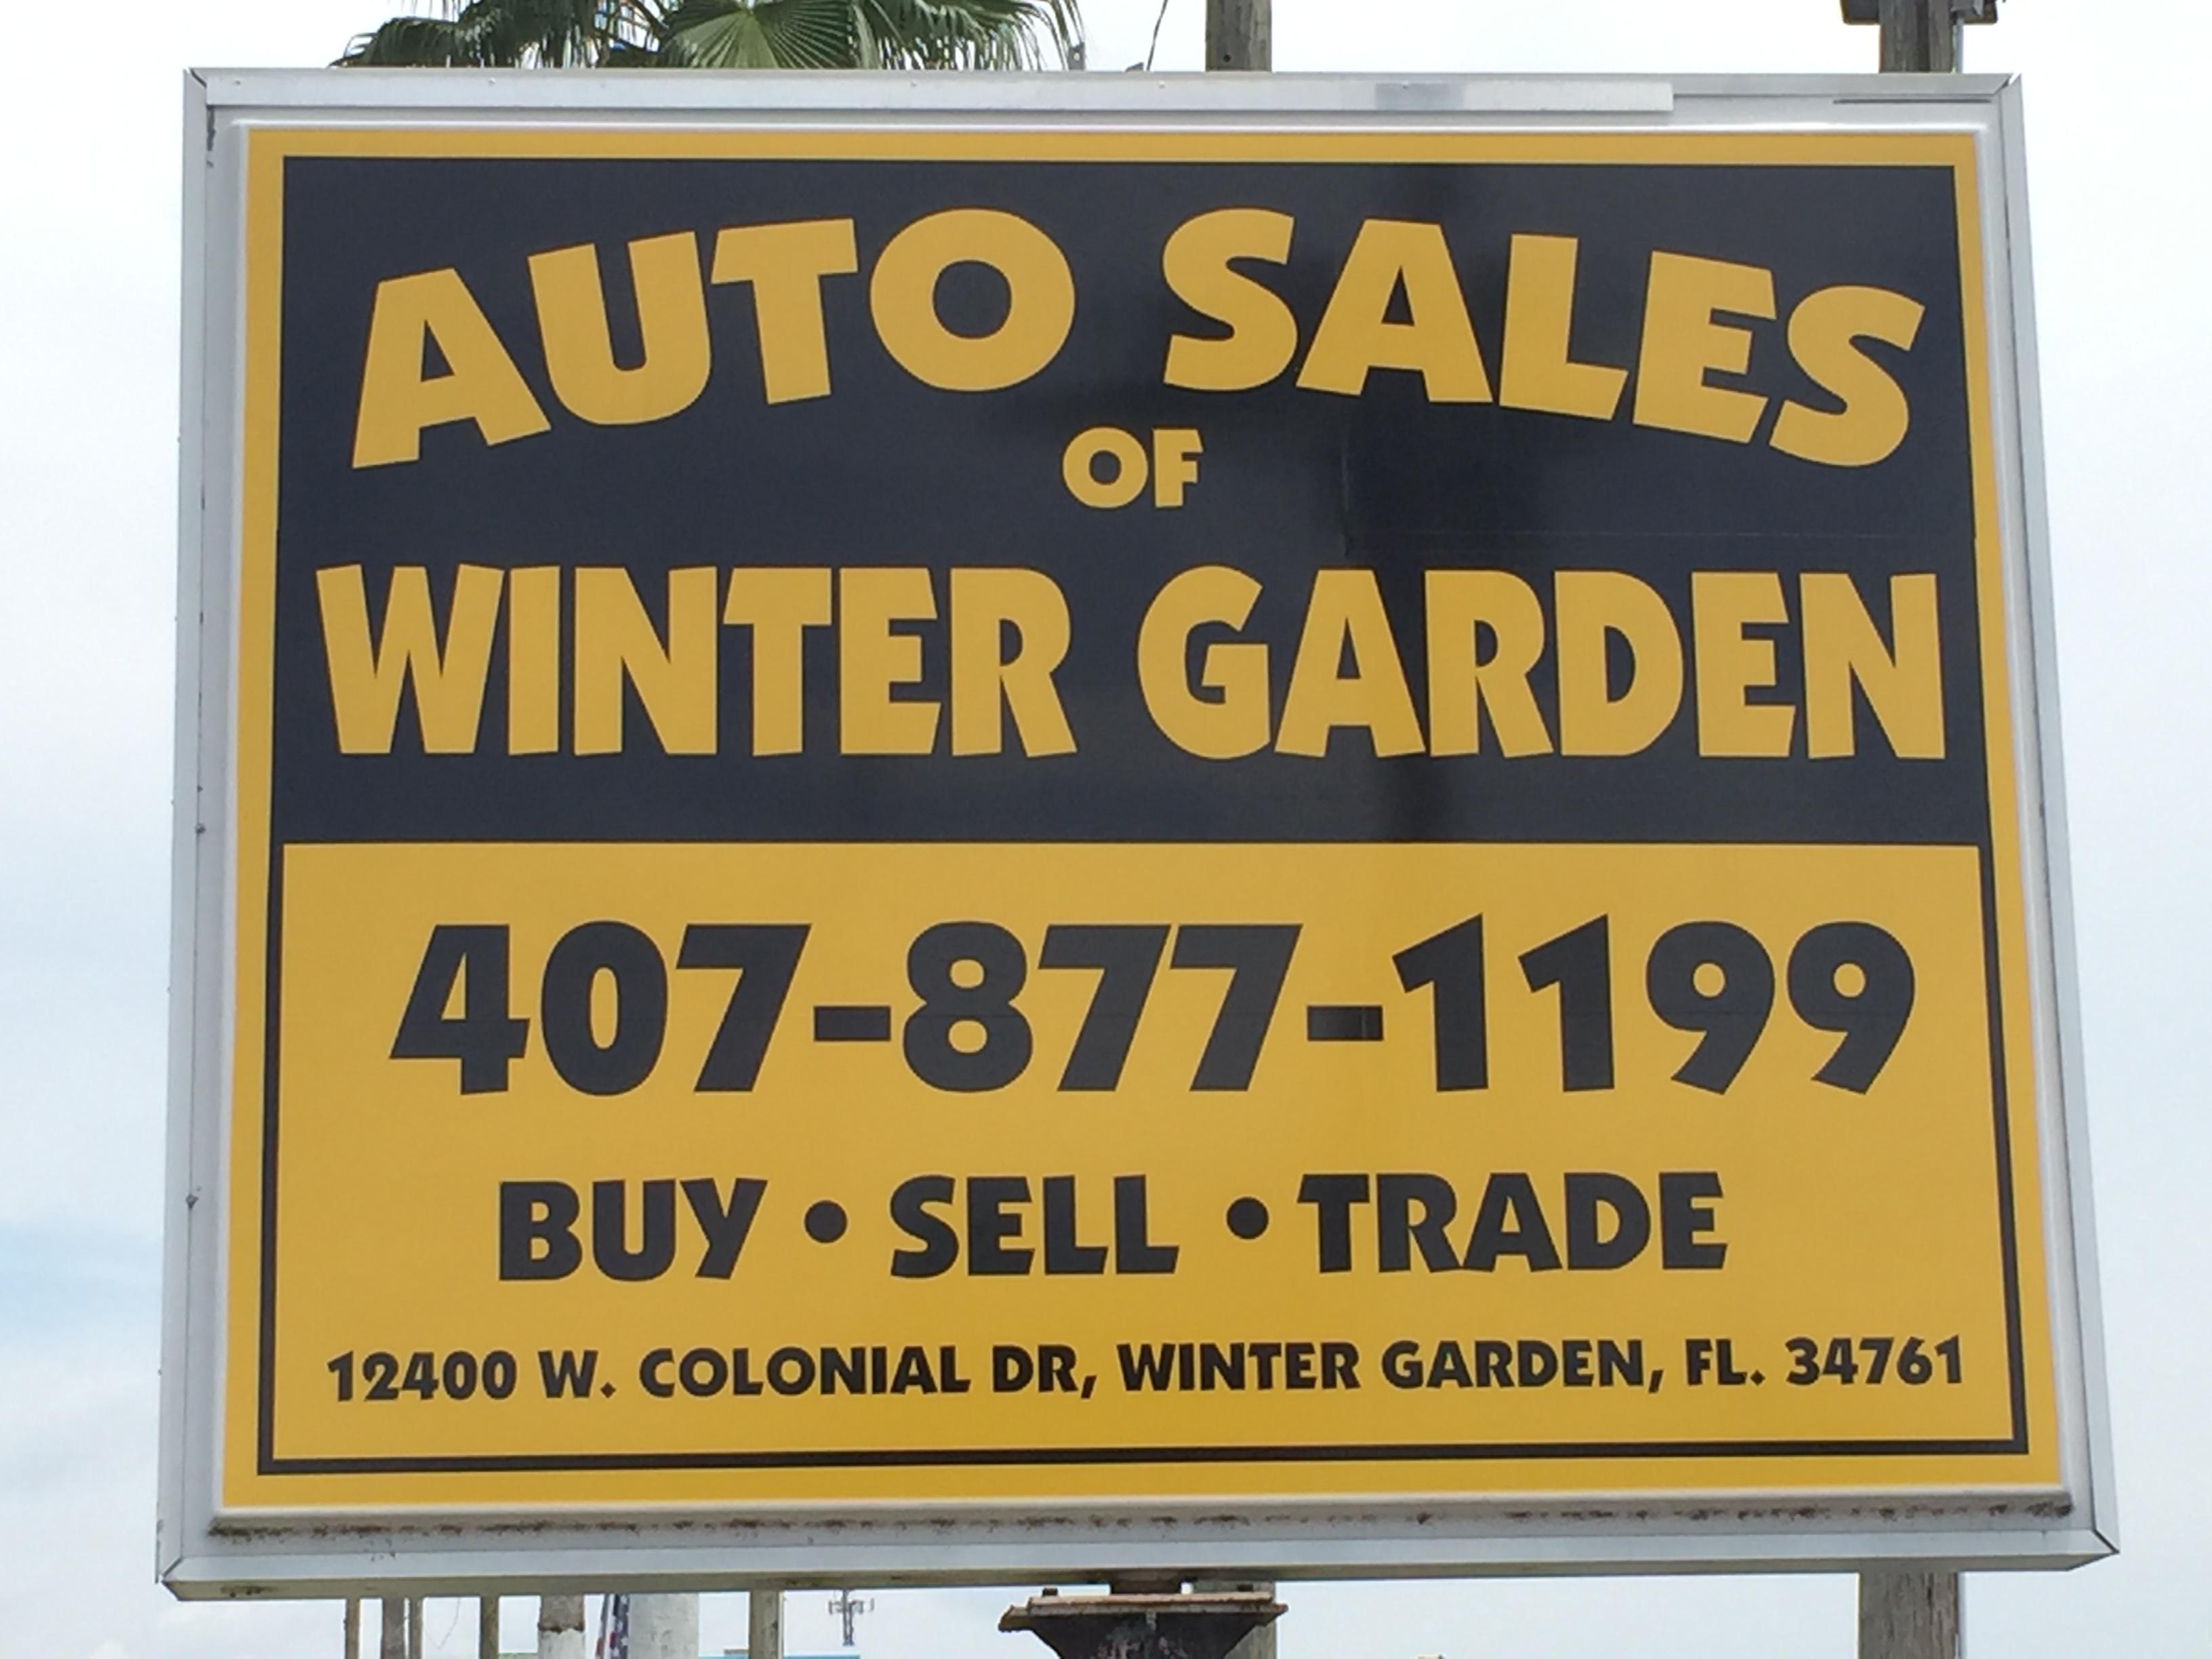 Auto Sales of Winter Garden